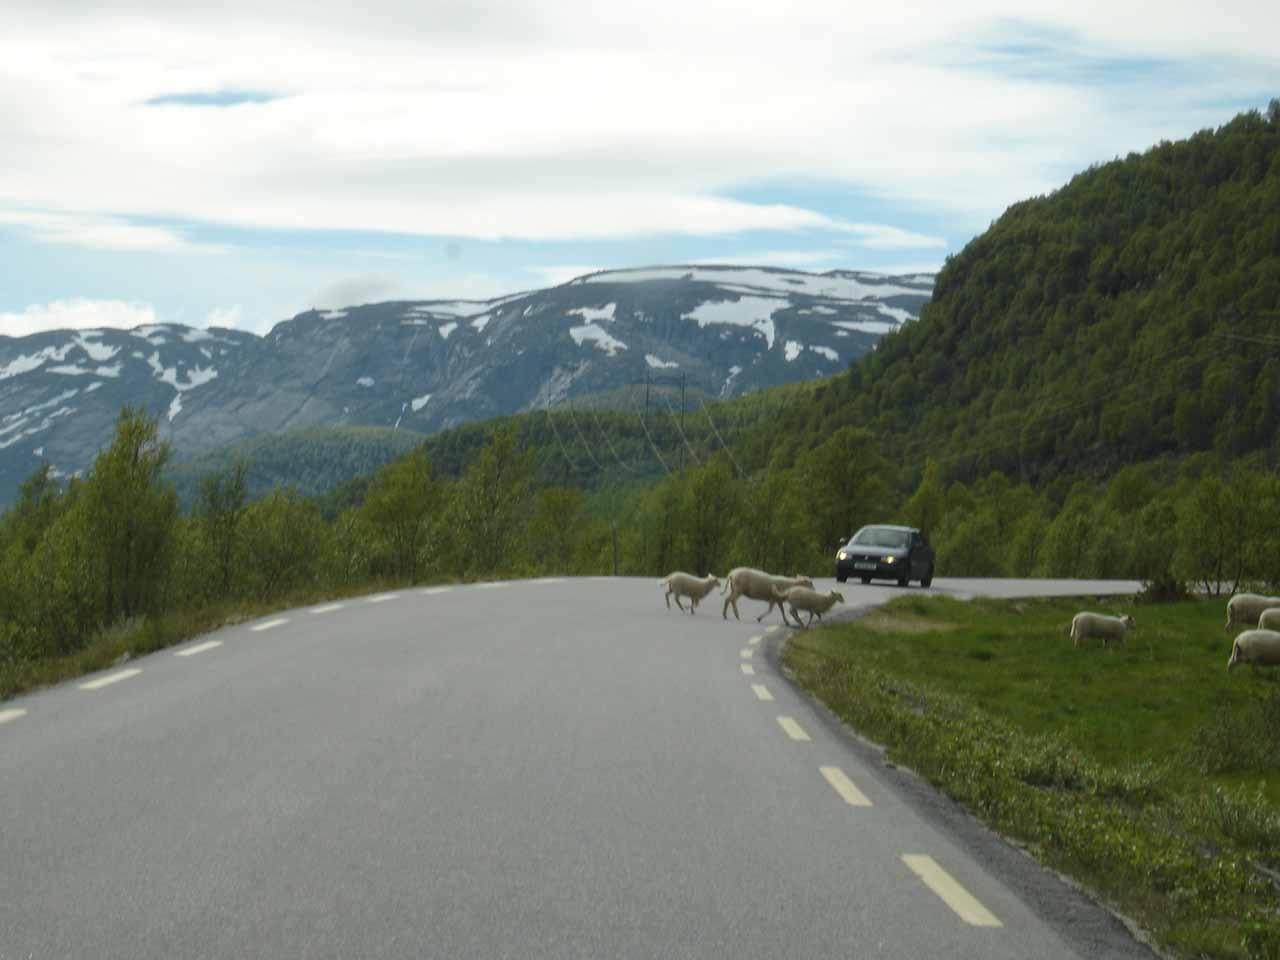 Sharing the Rv45 with sheep as we were driving between Rjukan and Setesdal